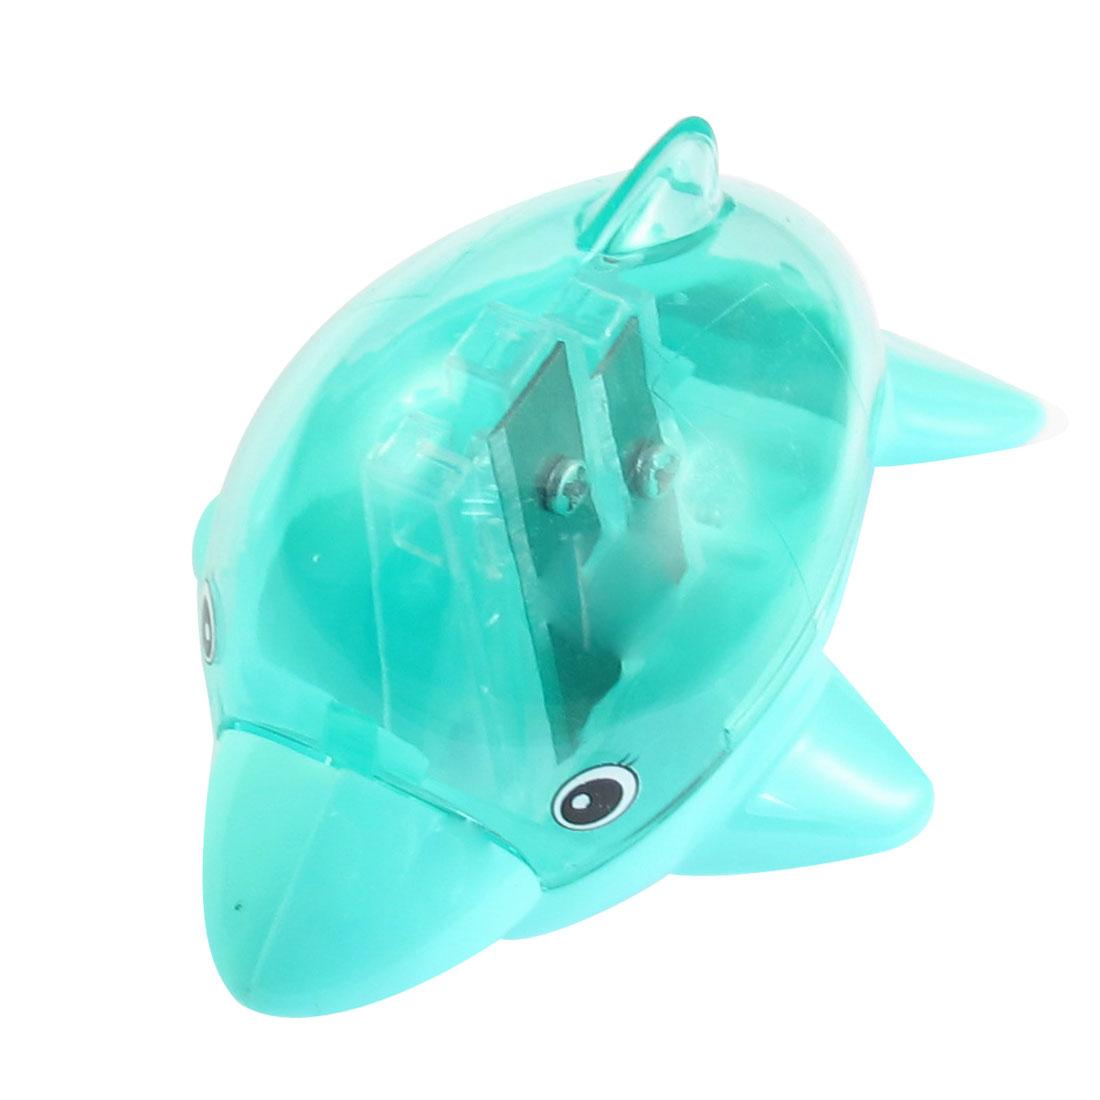 School Office Dolphin Design 2 Holes Green Plastic Shell Pencil Sharpener